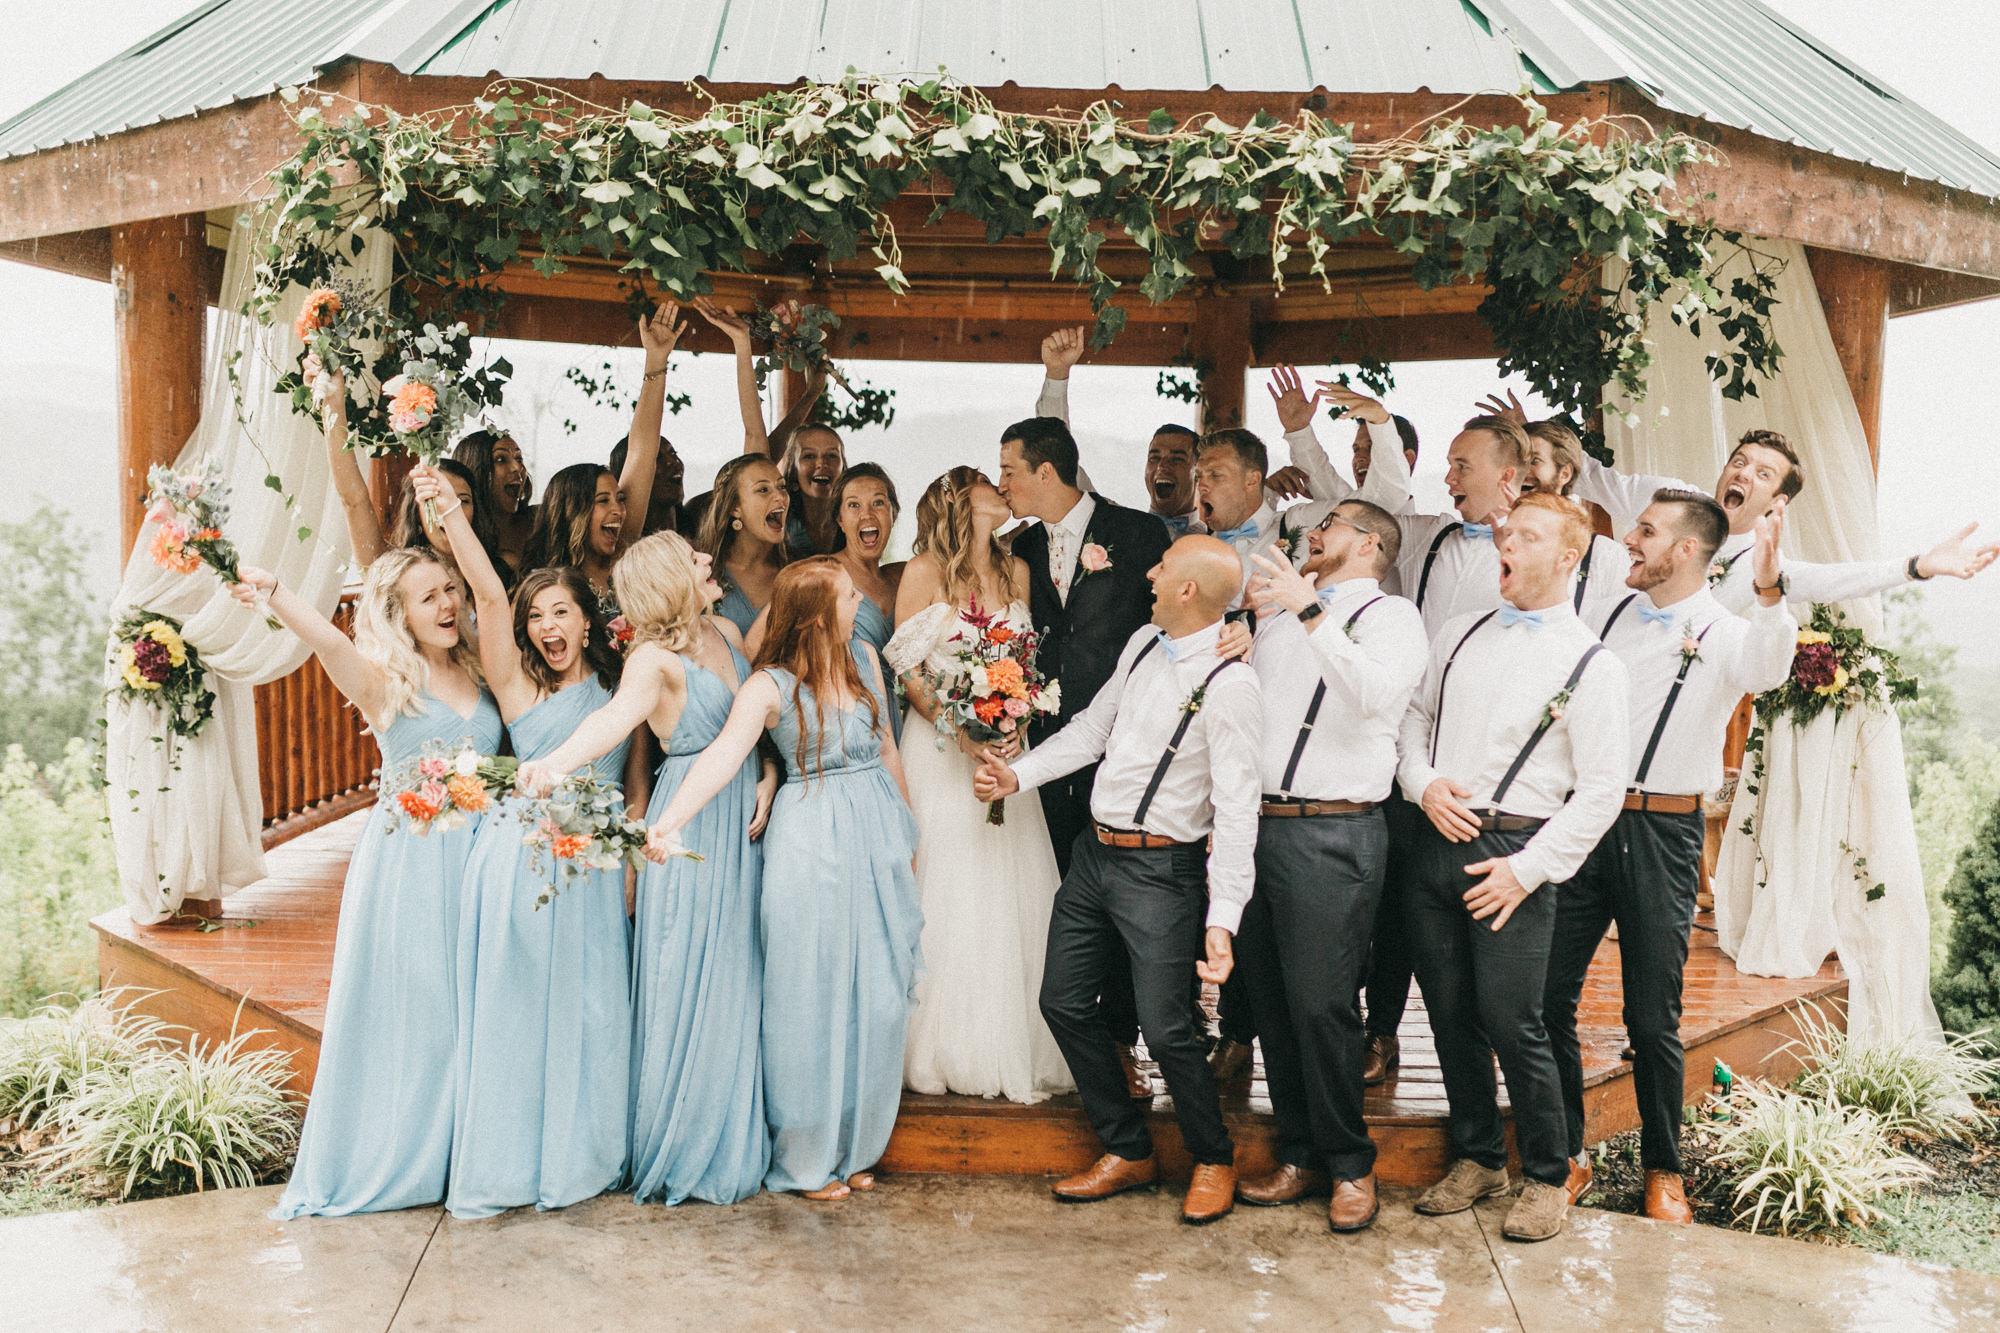 nashville_tennessee_wedding_photographer-91.jpg